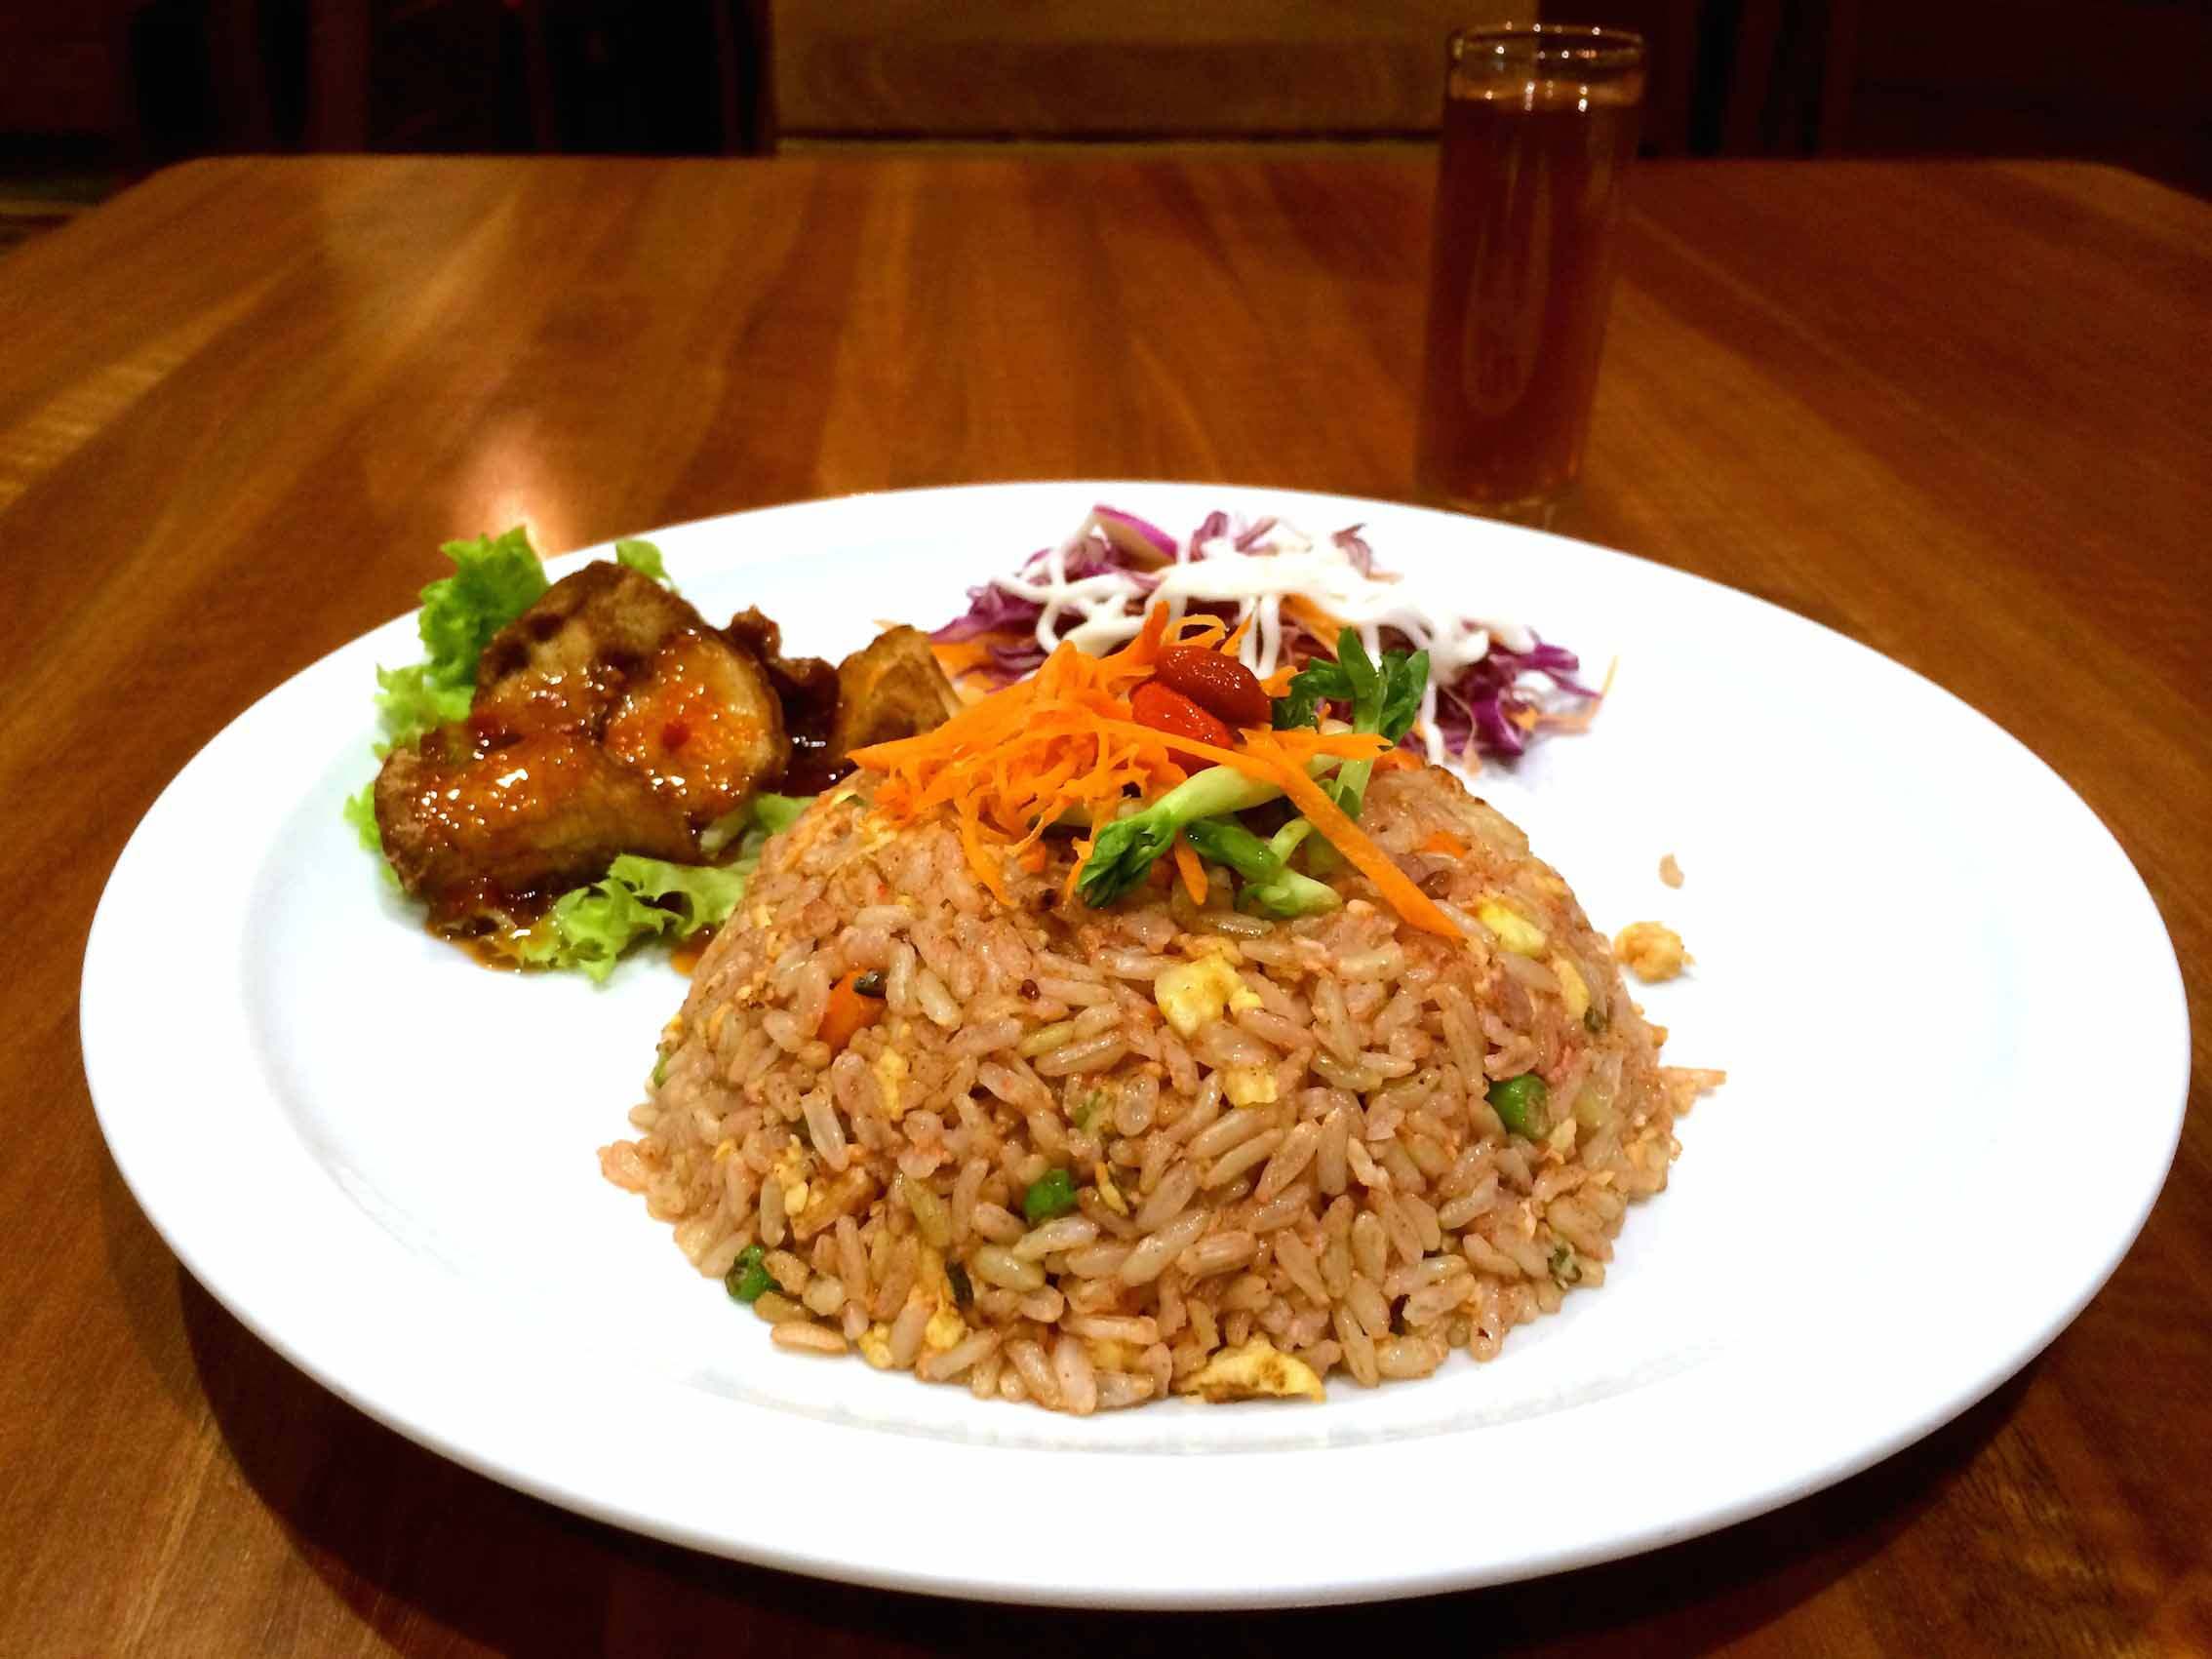 Journey2Life 旅人蔬食。人文空间:红糟炒饭  Fried Rice